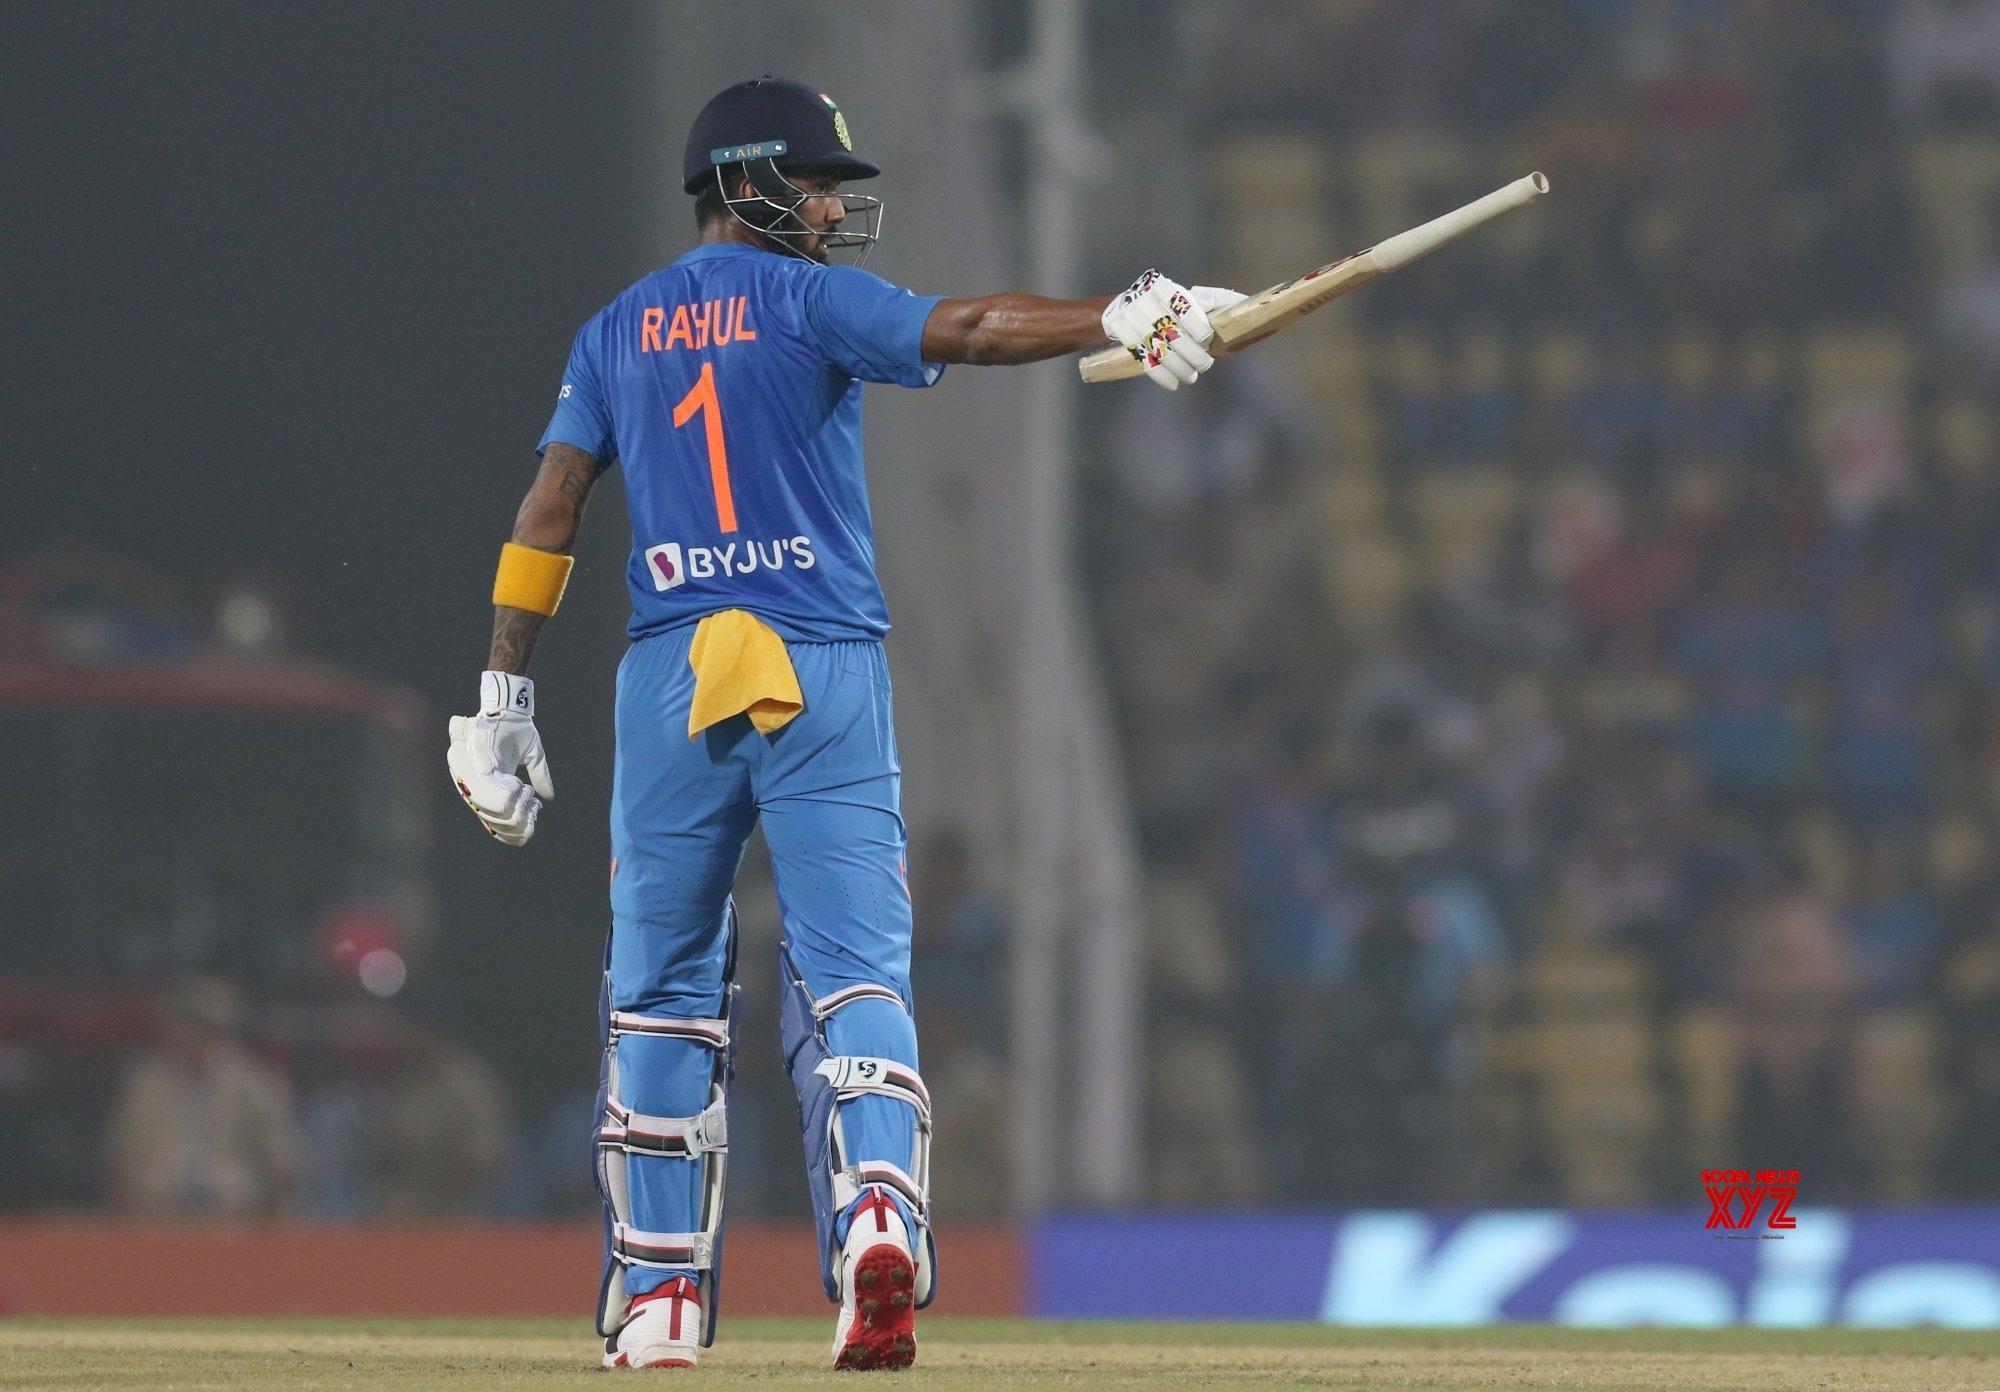 Nagpur: 3rd T20I - India Vs Bangladesh (Batch - 5) #Gallery